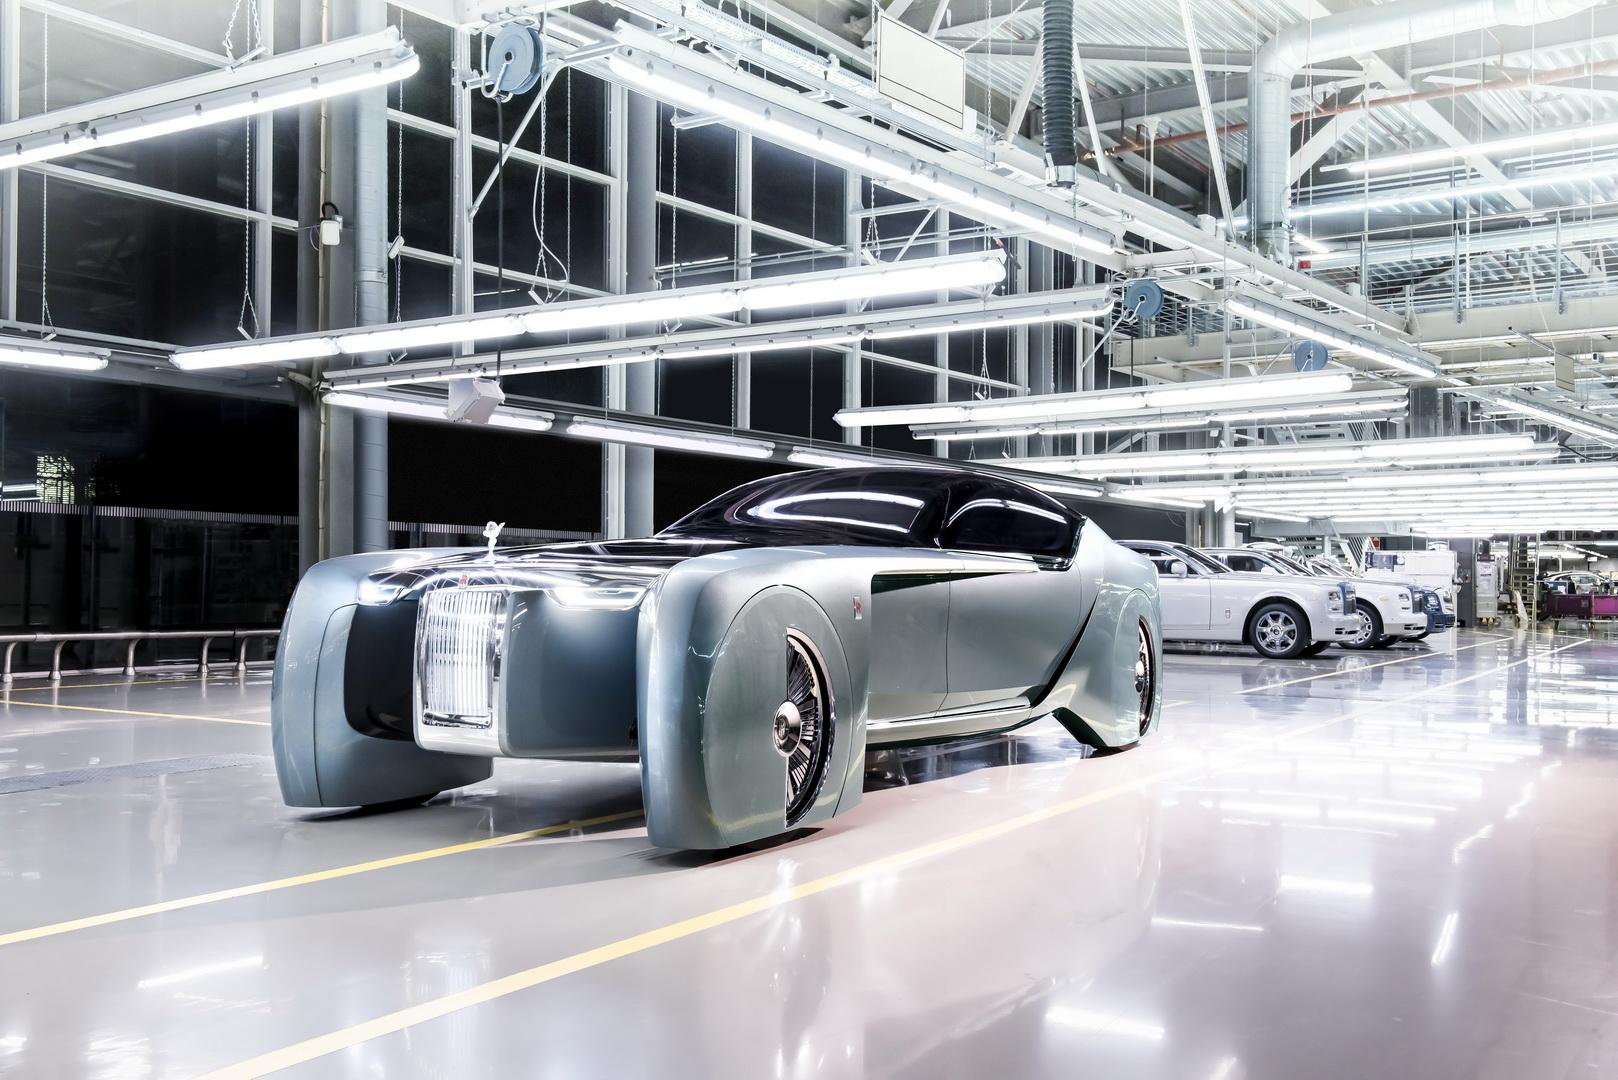 Rolls-Royce Vision Next 100